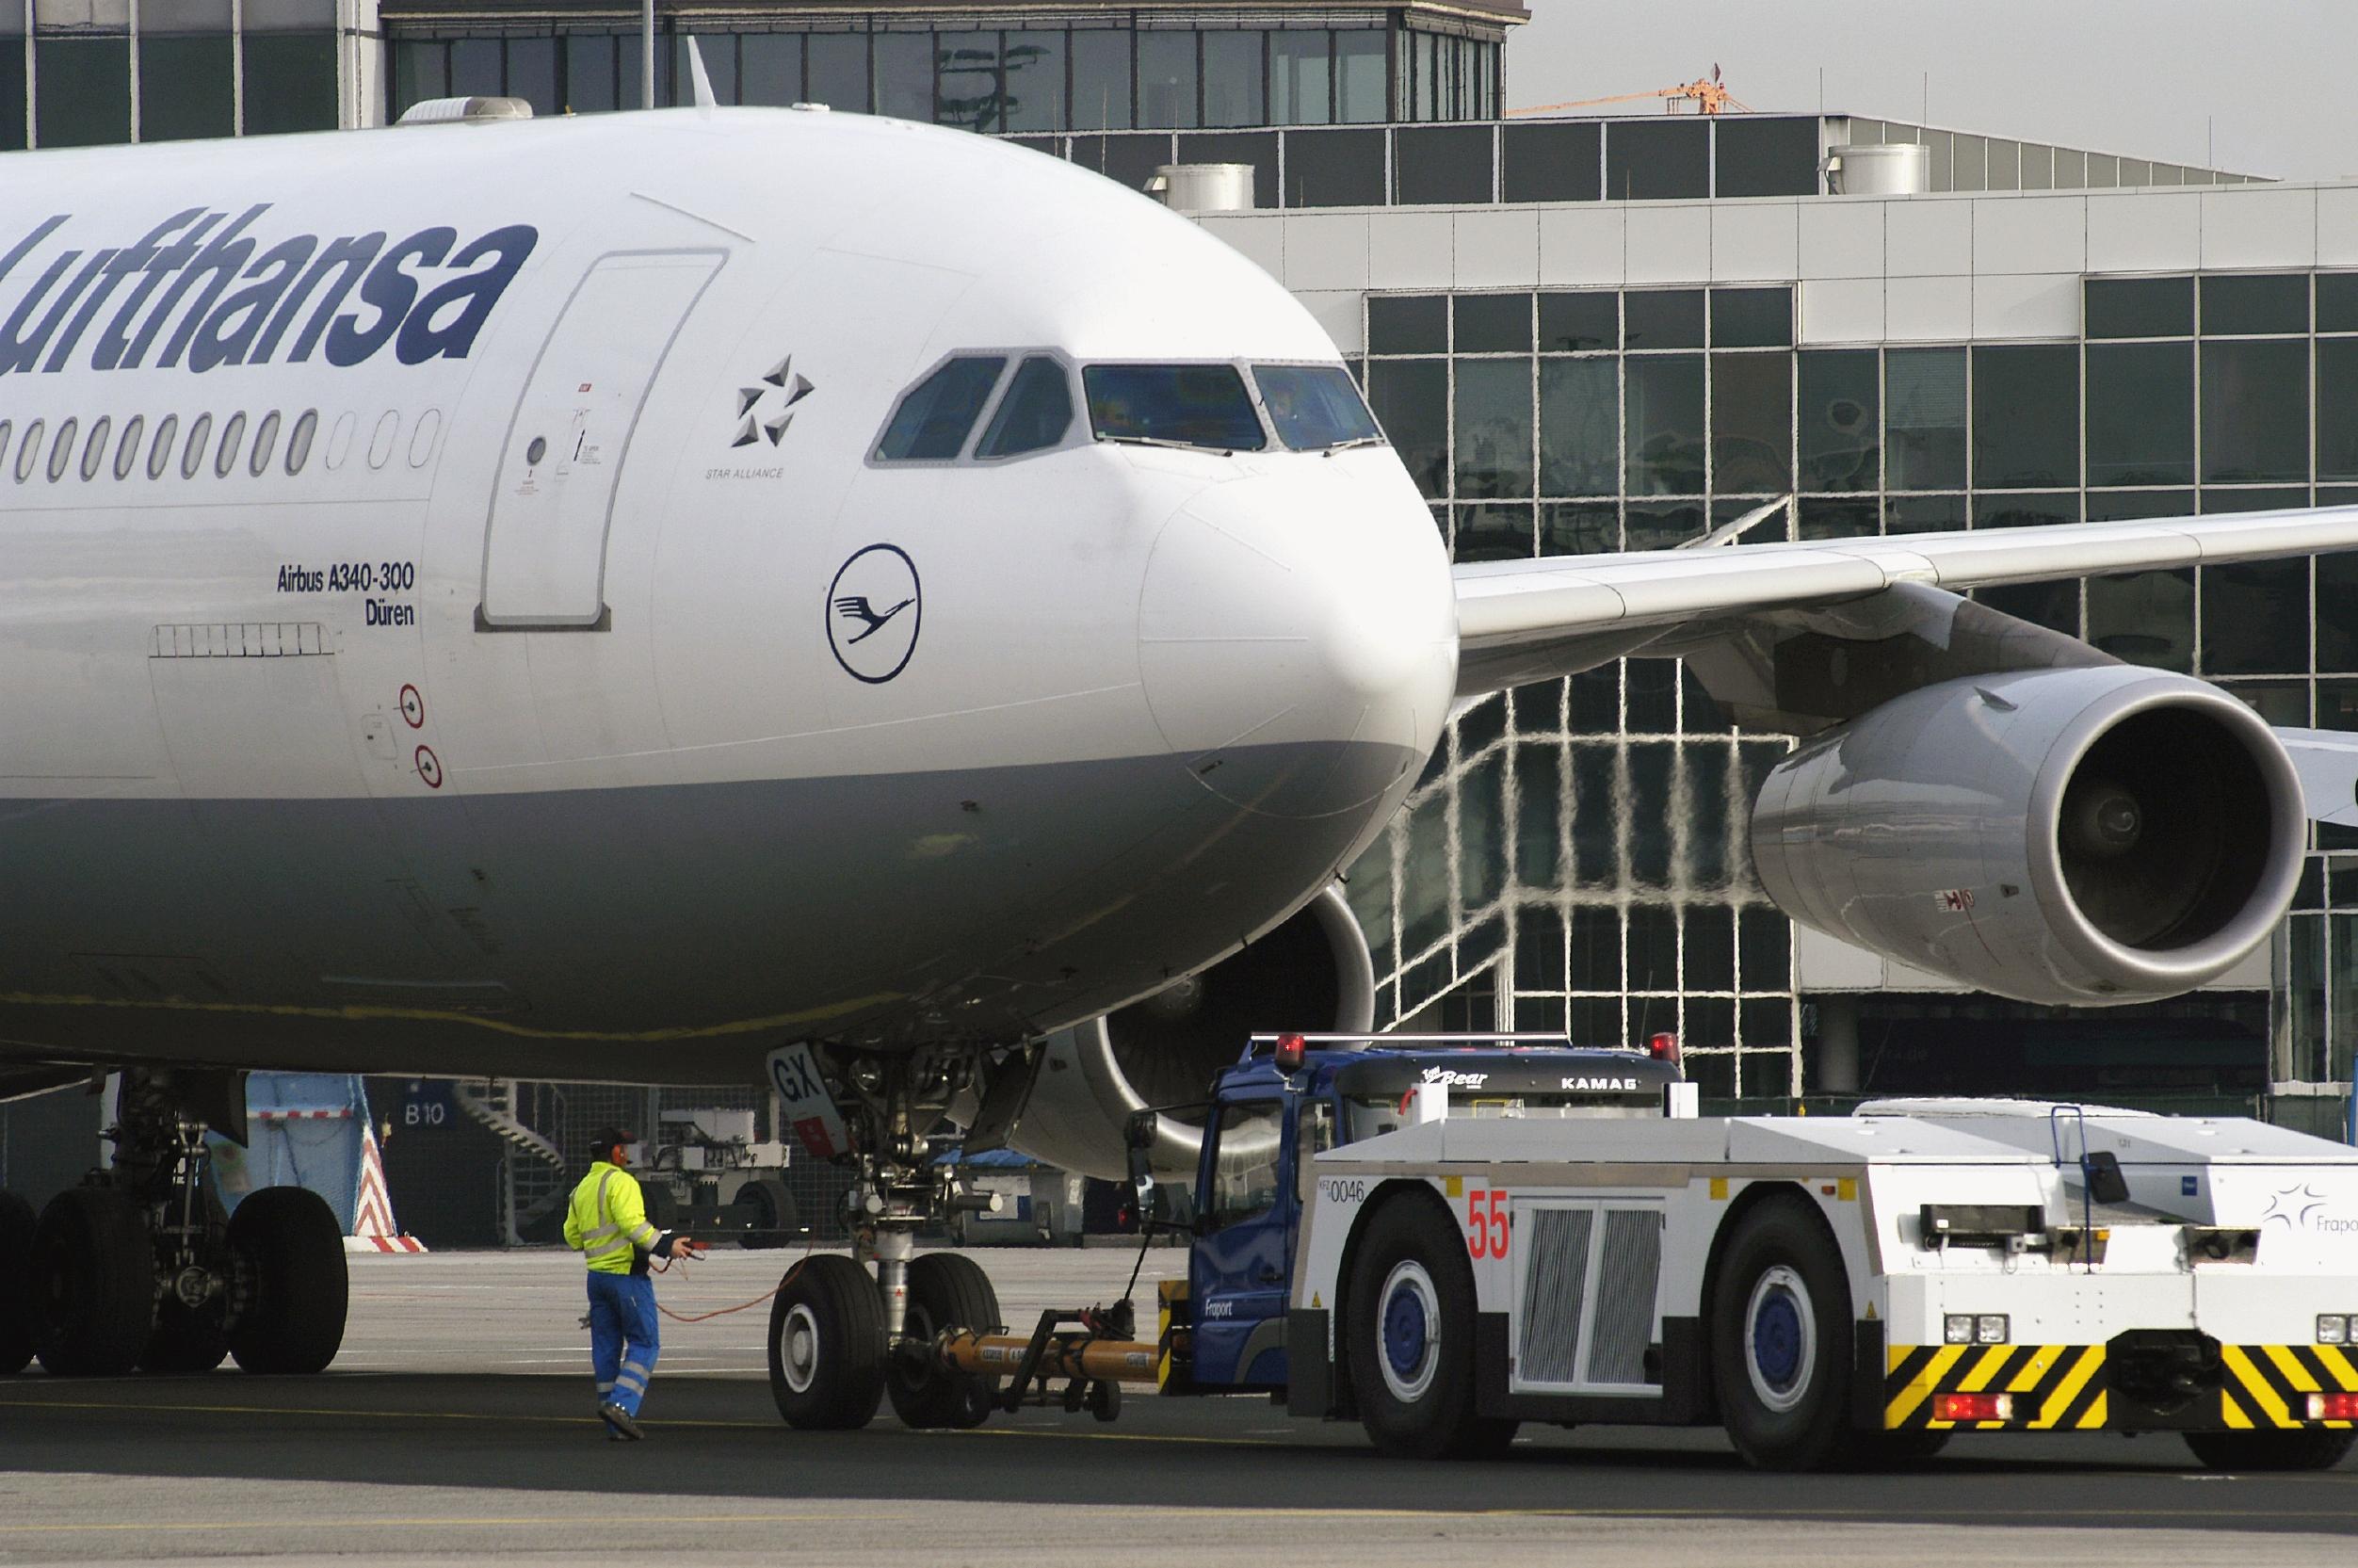 Lufthansa Airbus A340-300 (Foto: Foto: Ingrid Friedl Lufthansa,11.2005 )